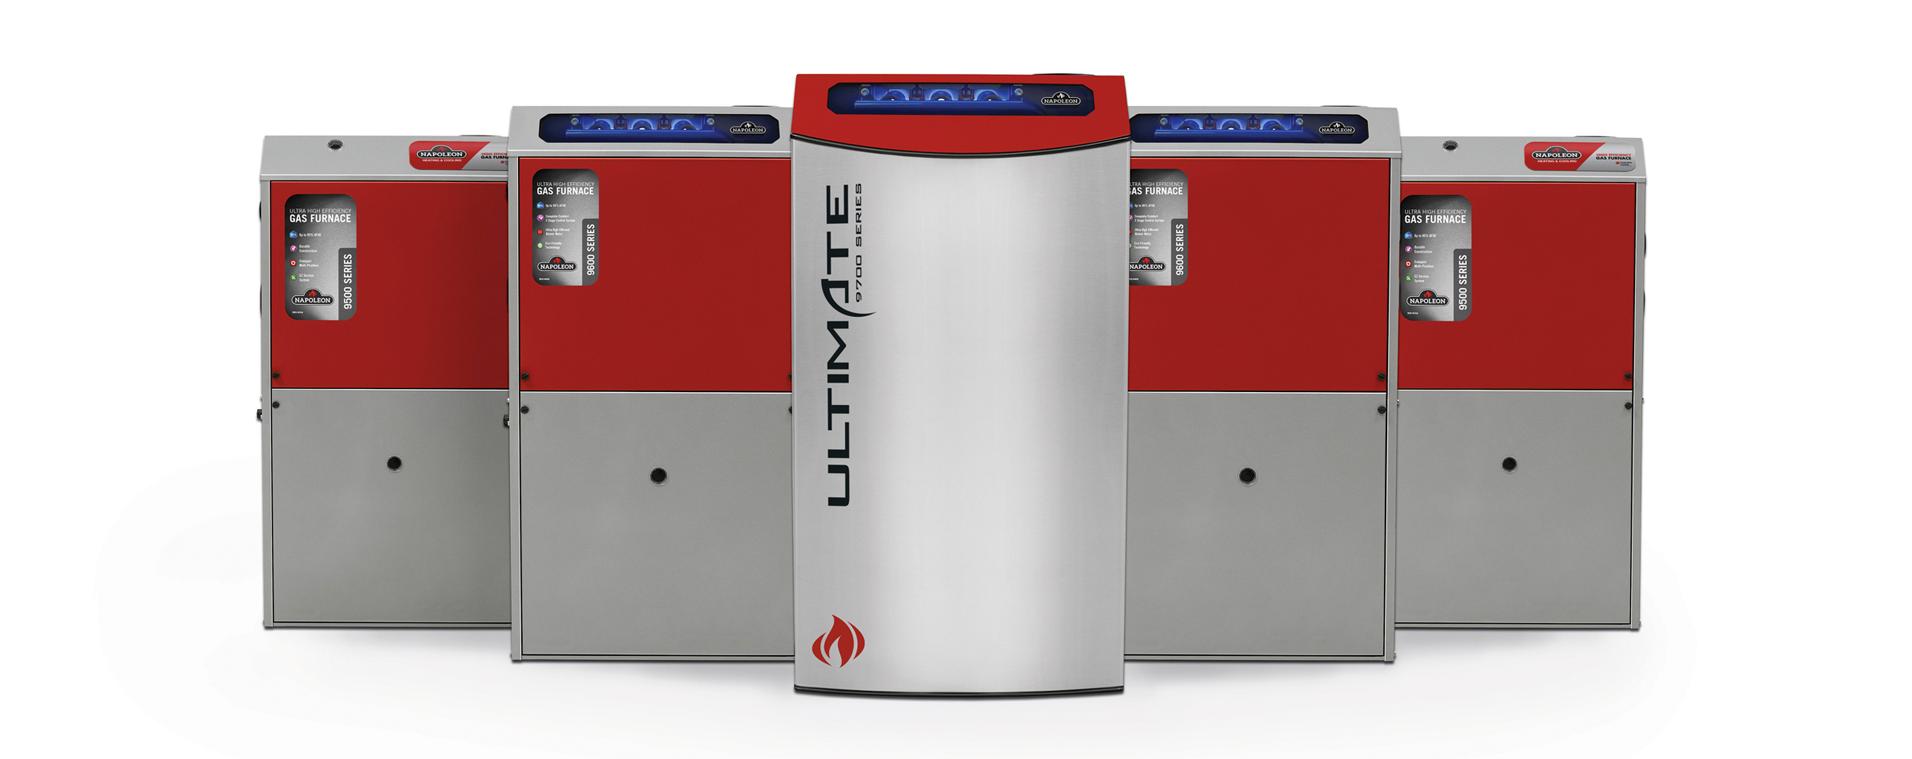 Nepoleon Ultimate Gas Furnace